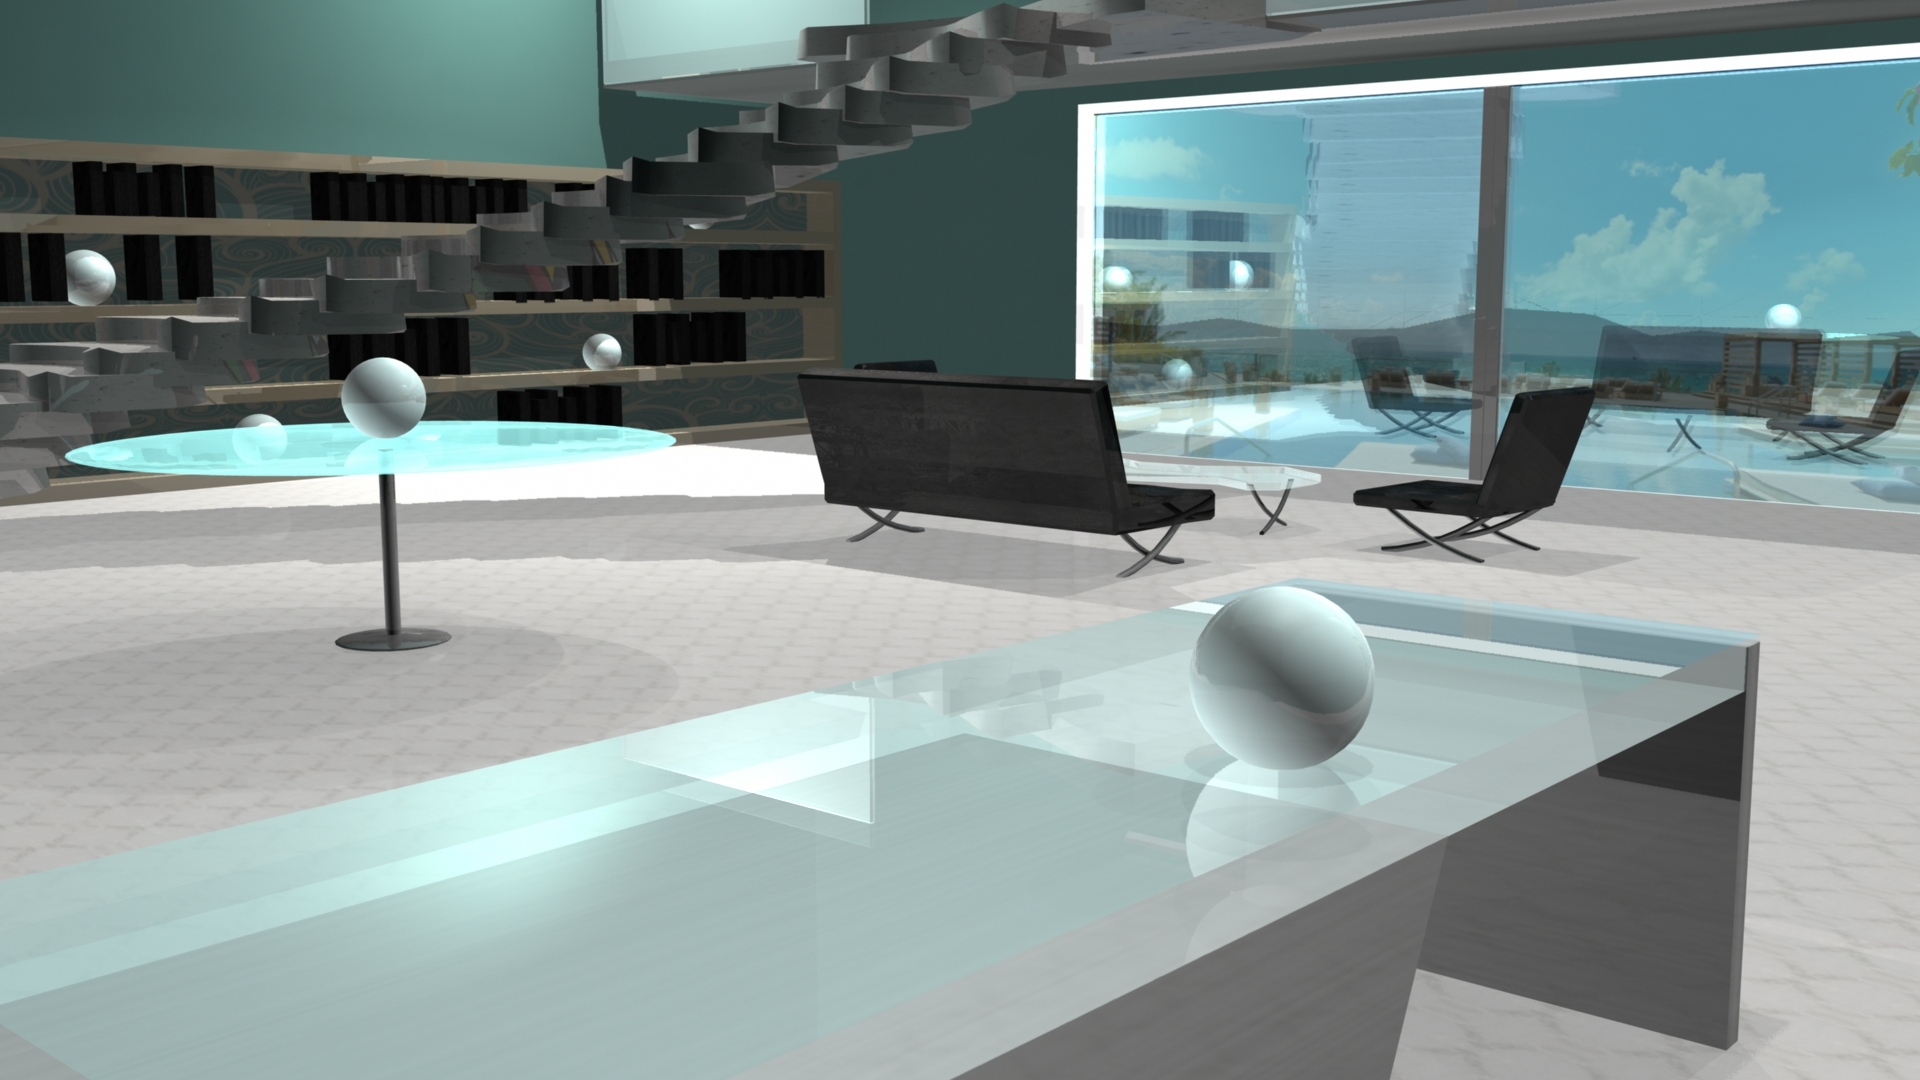 Hotel Lobby Design 3